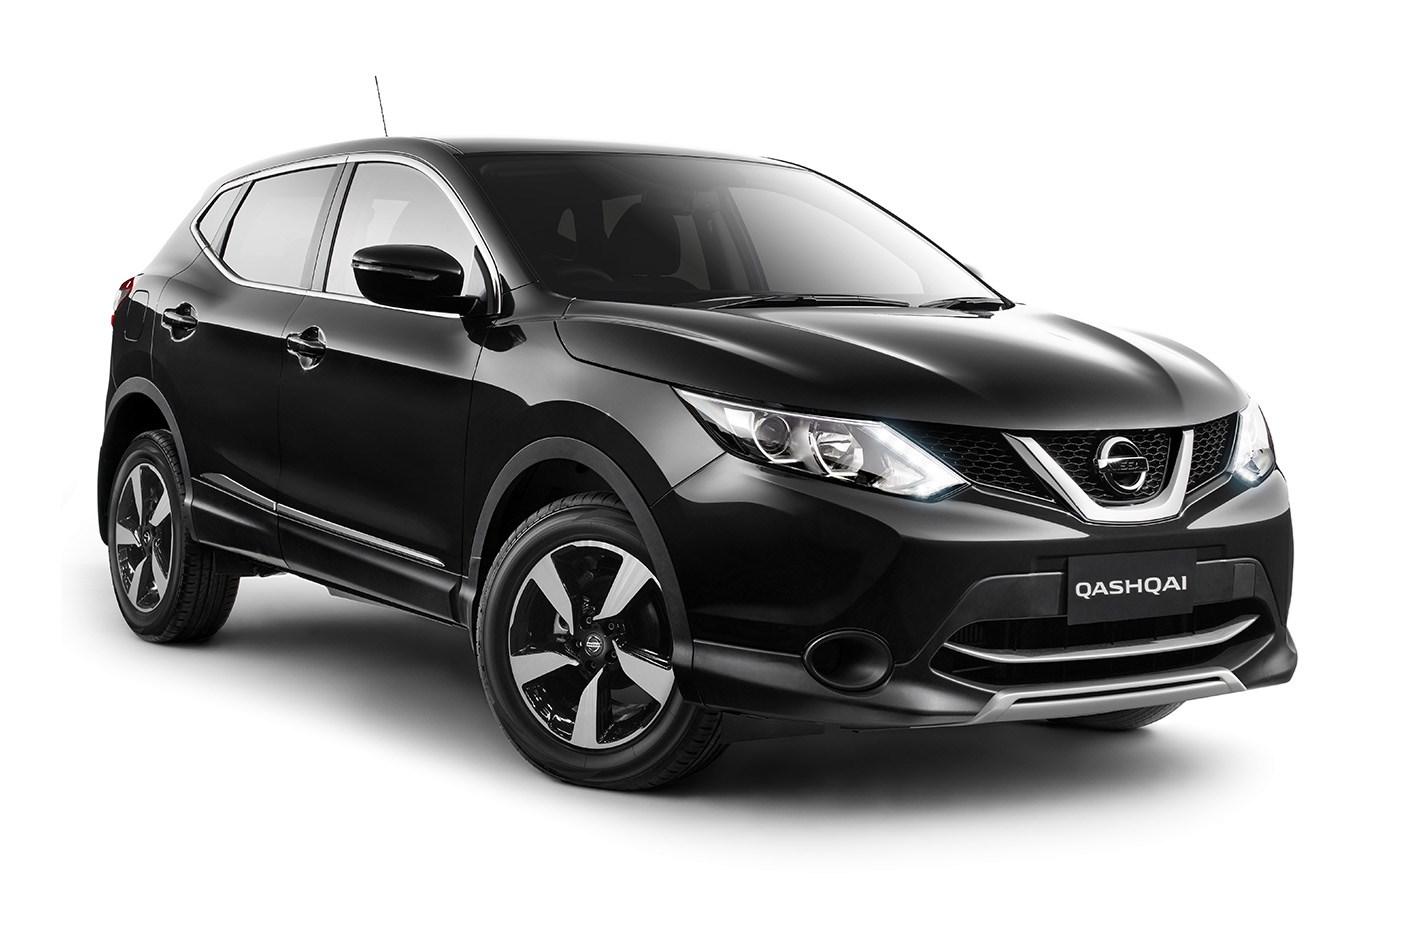 Nissan Qashqai Usa Price >> Nissan Qashqai 2018 Review Price Features